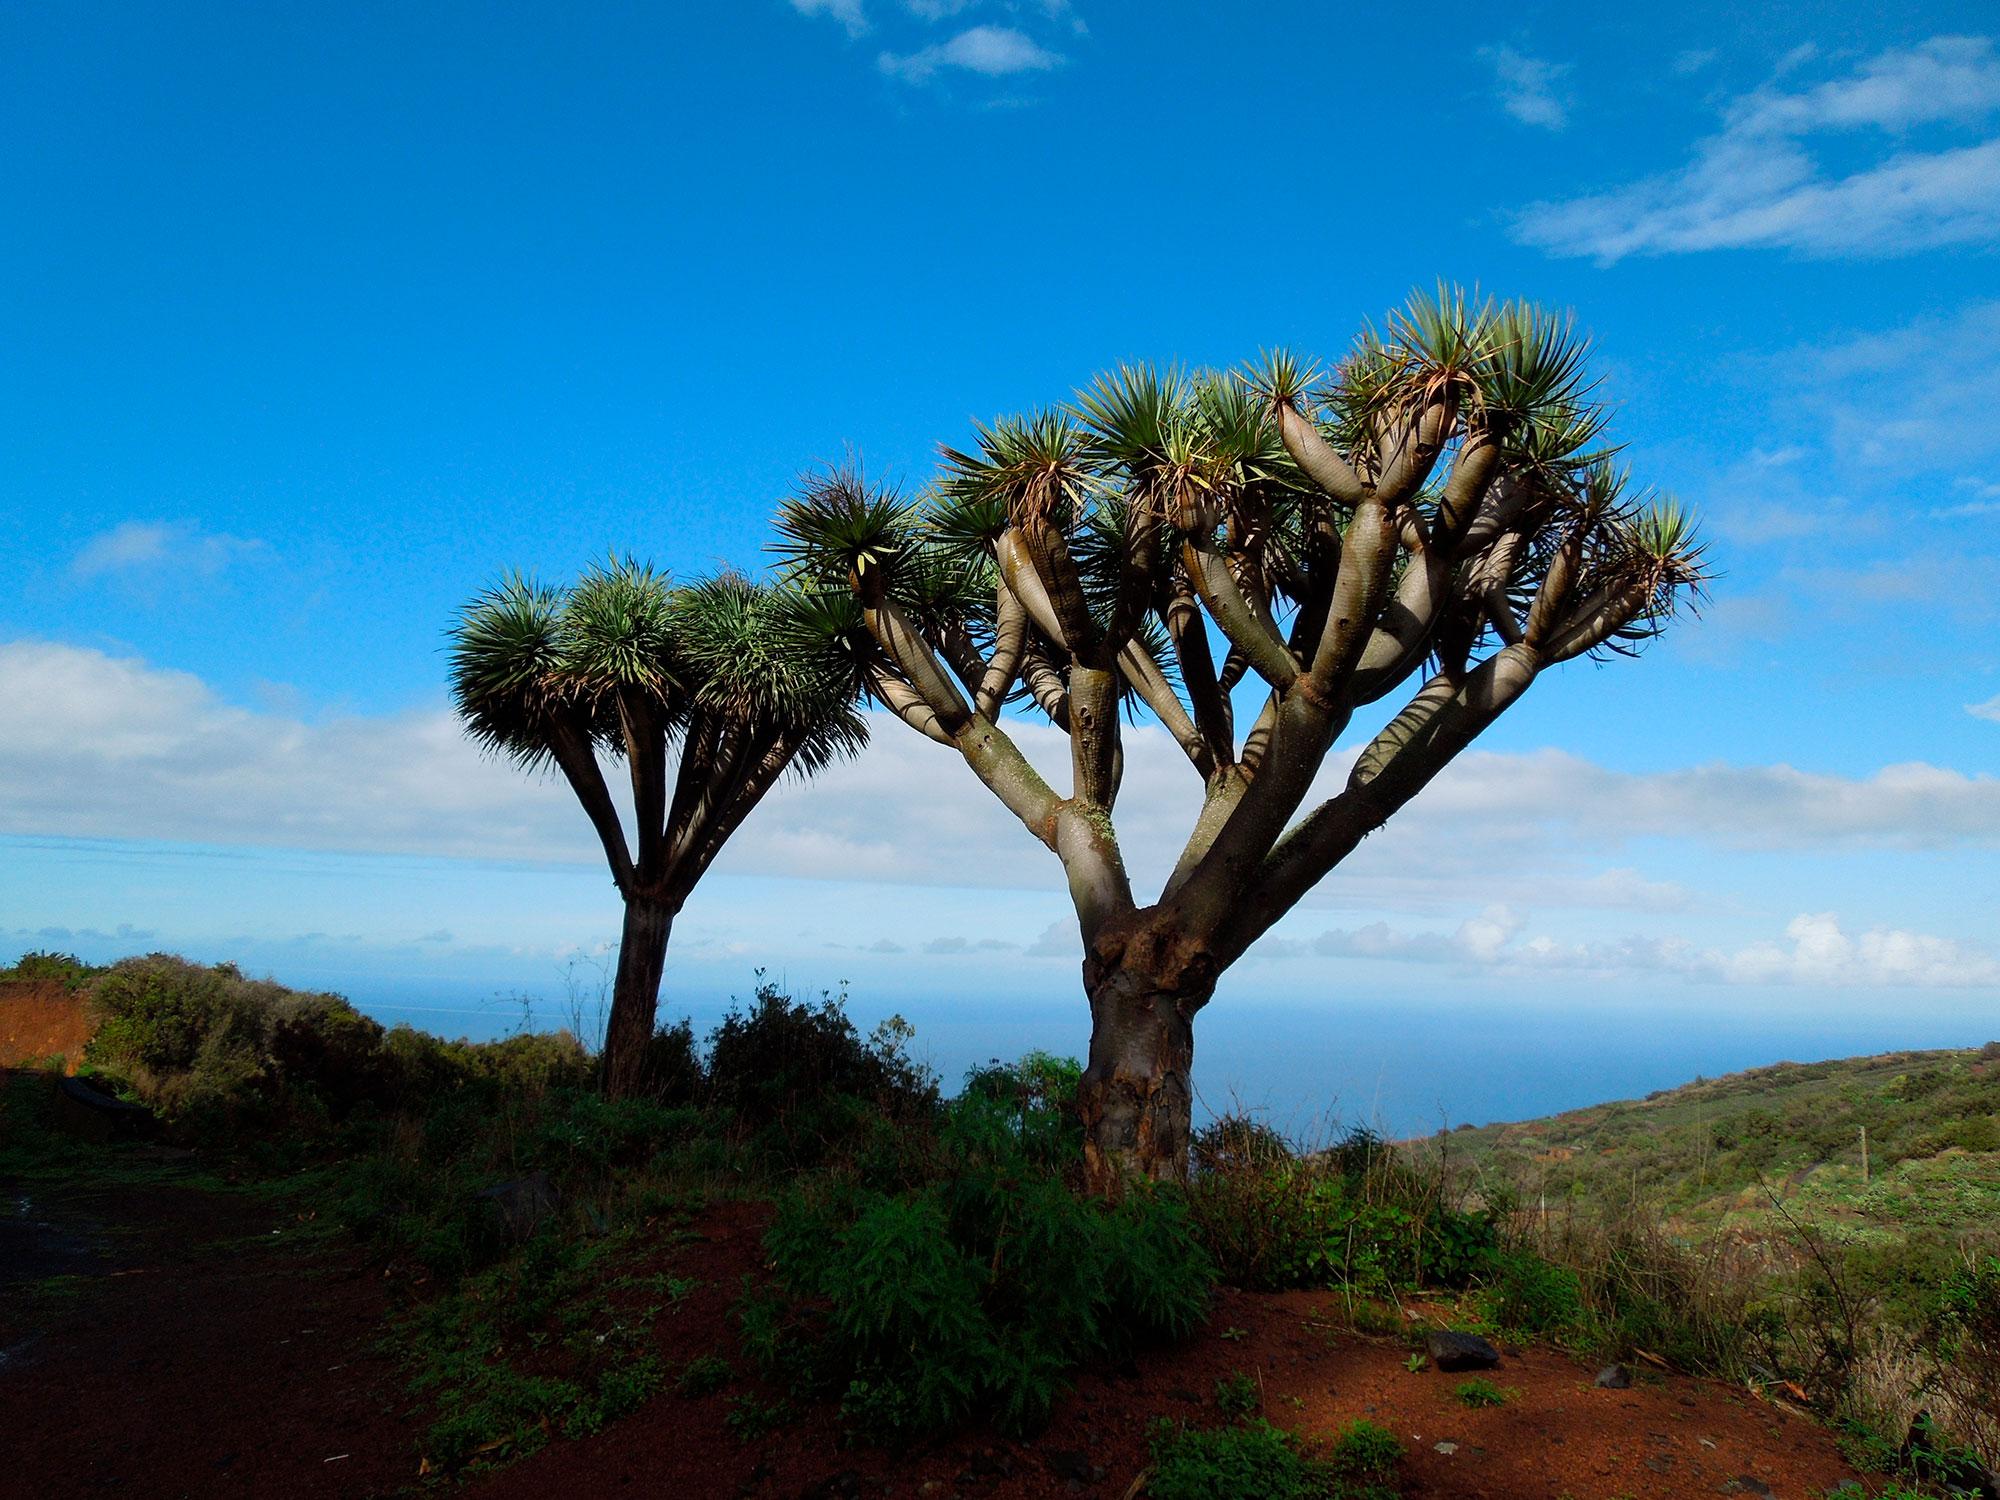 Naturaleza mágica, paisajes increibles, Islas Canarias - España- imagen #6